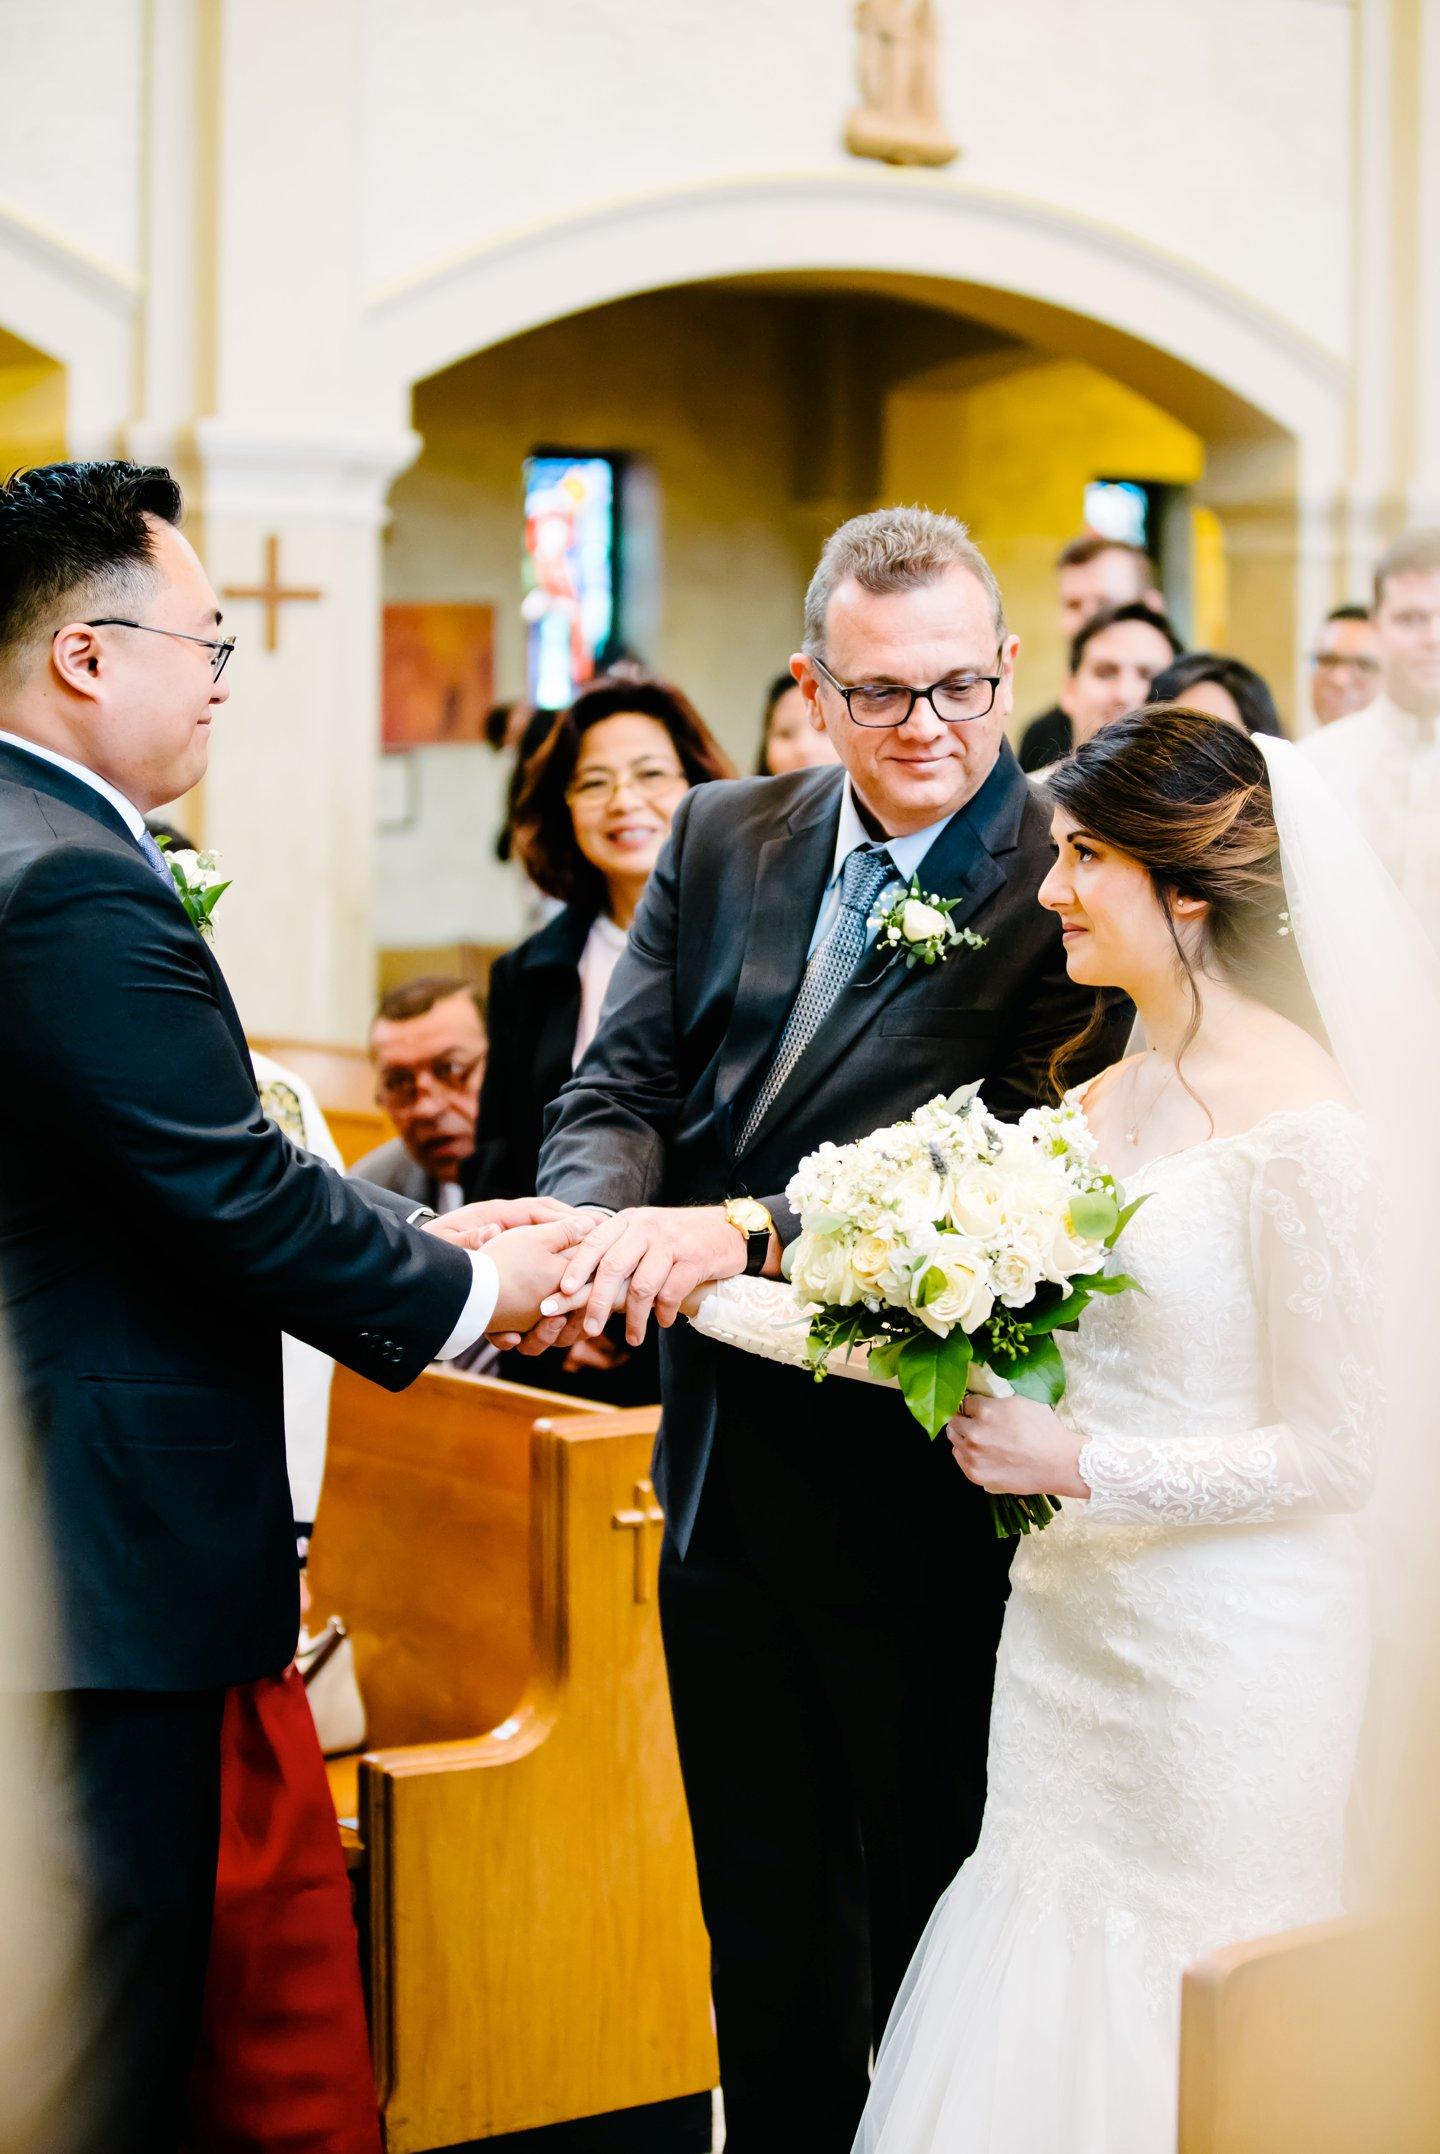 lake-geneva-fine-art-wedding-photographer-santos18